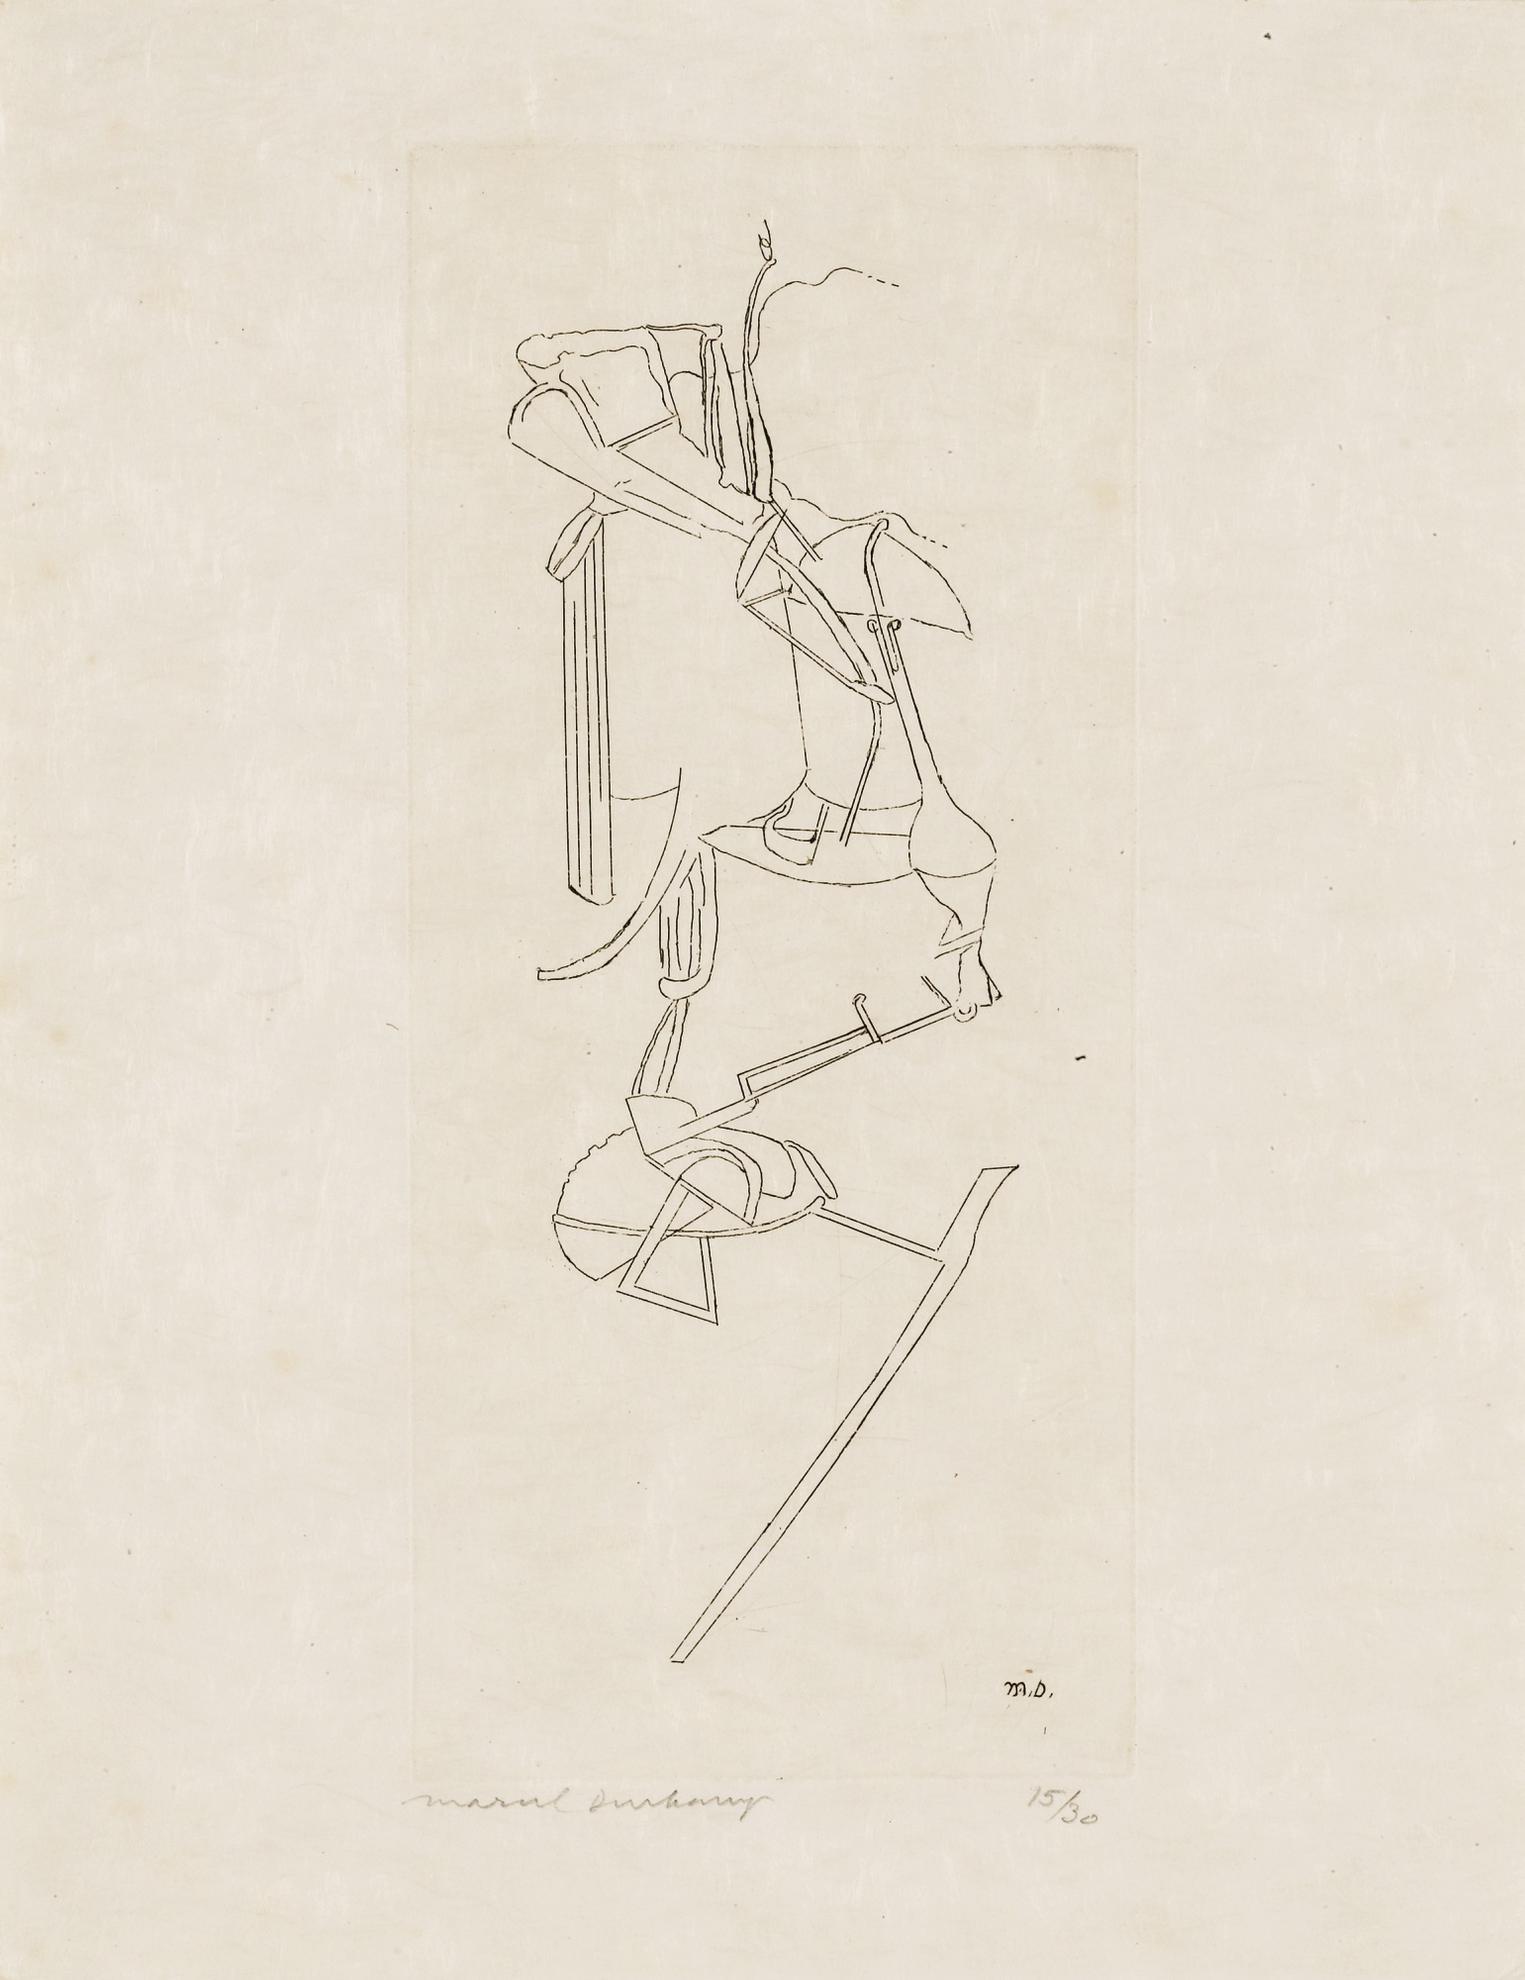 Marcel Duchamp-The Bride-1965